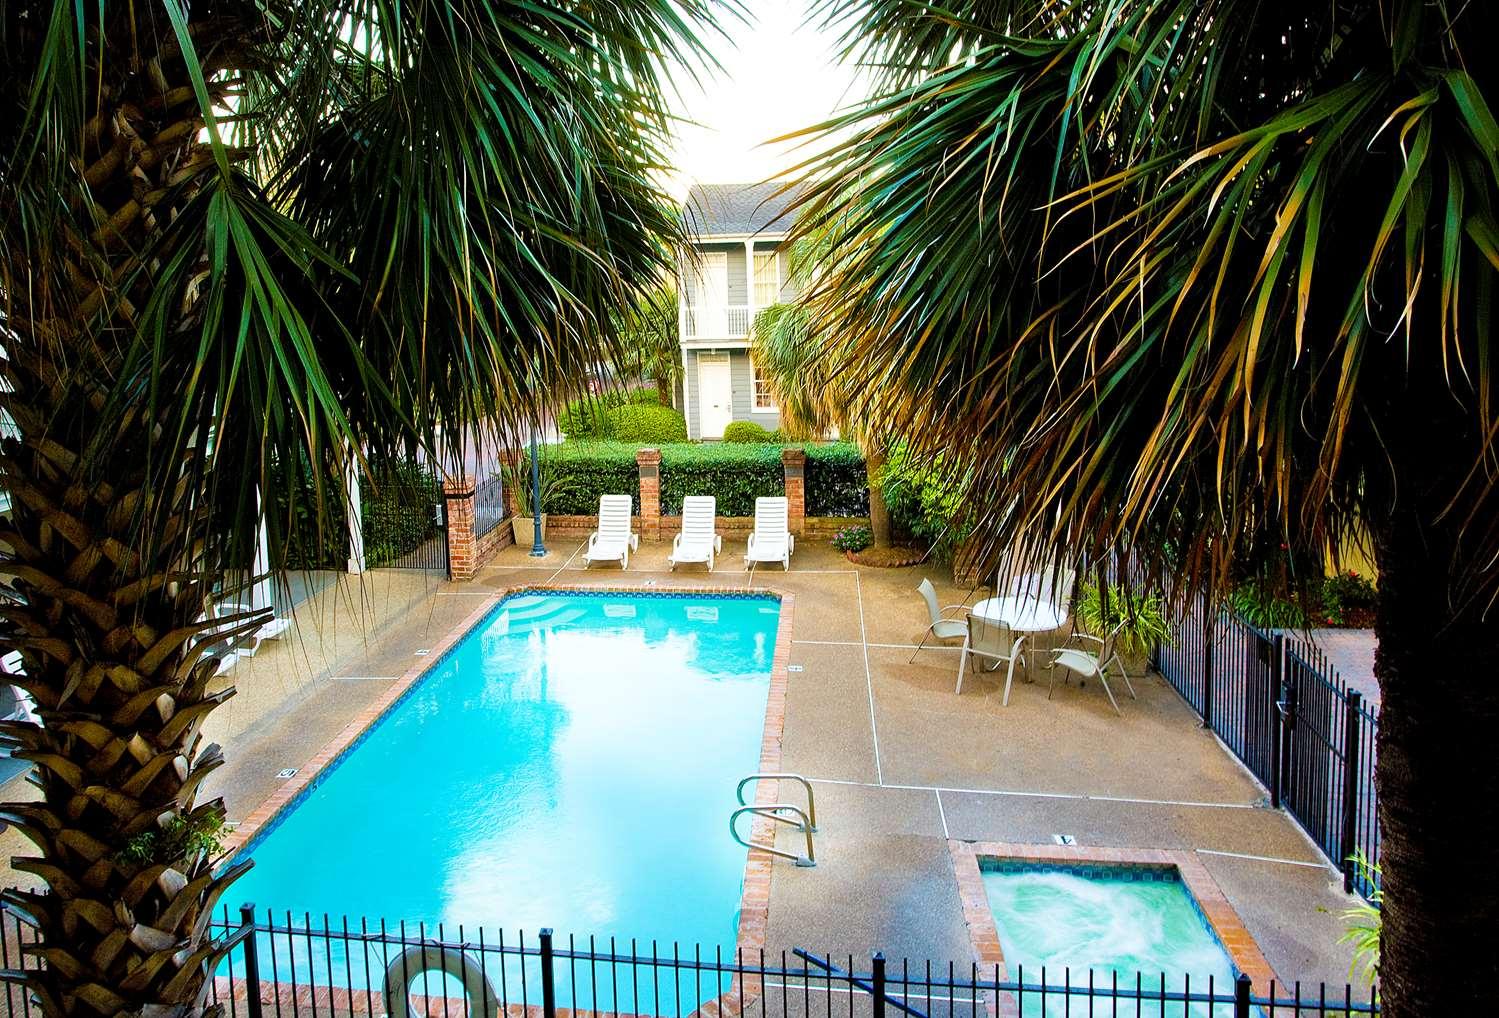 Pool - Maison Saint Charles by Hotel RL